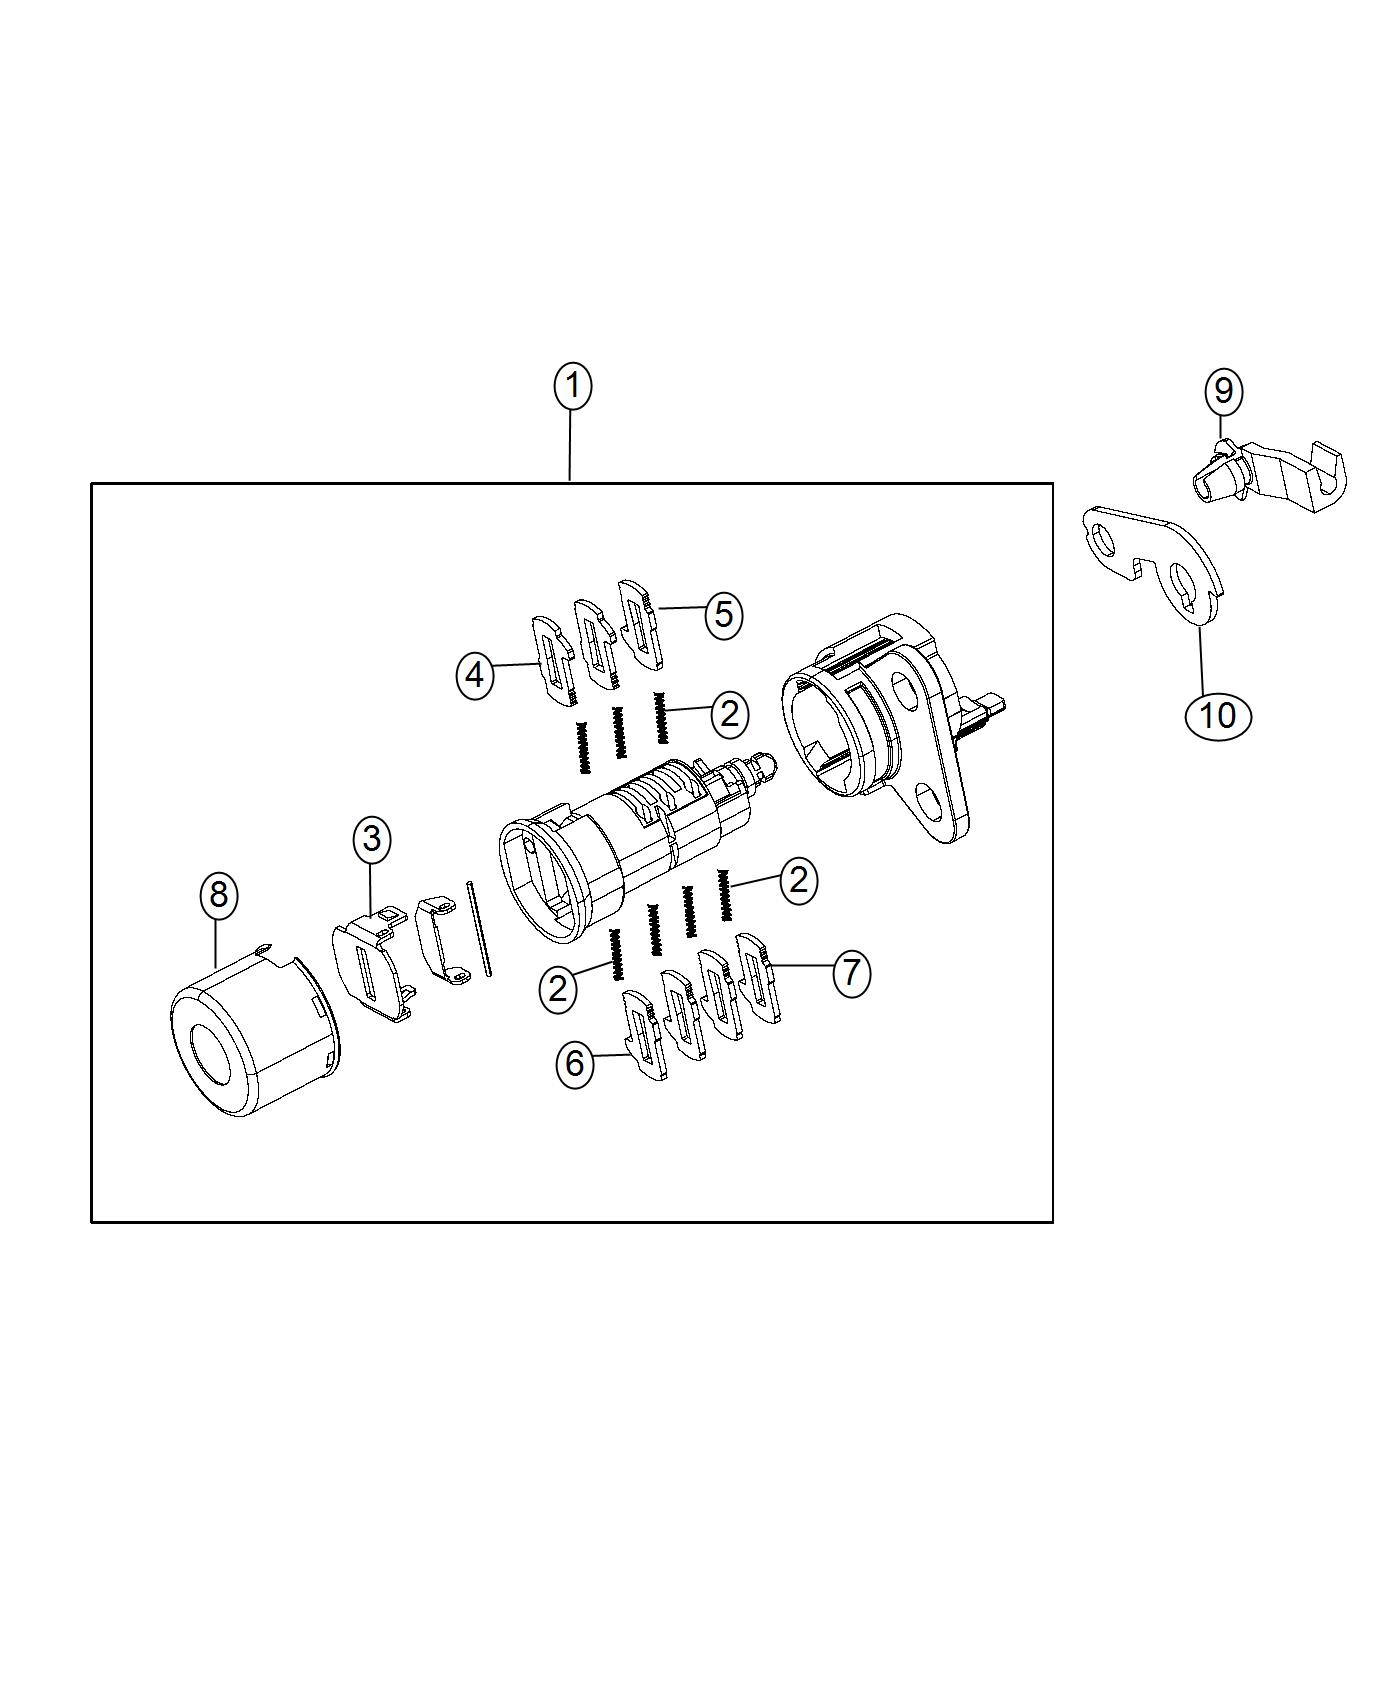 79 jeep cherokee fuel system diagram